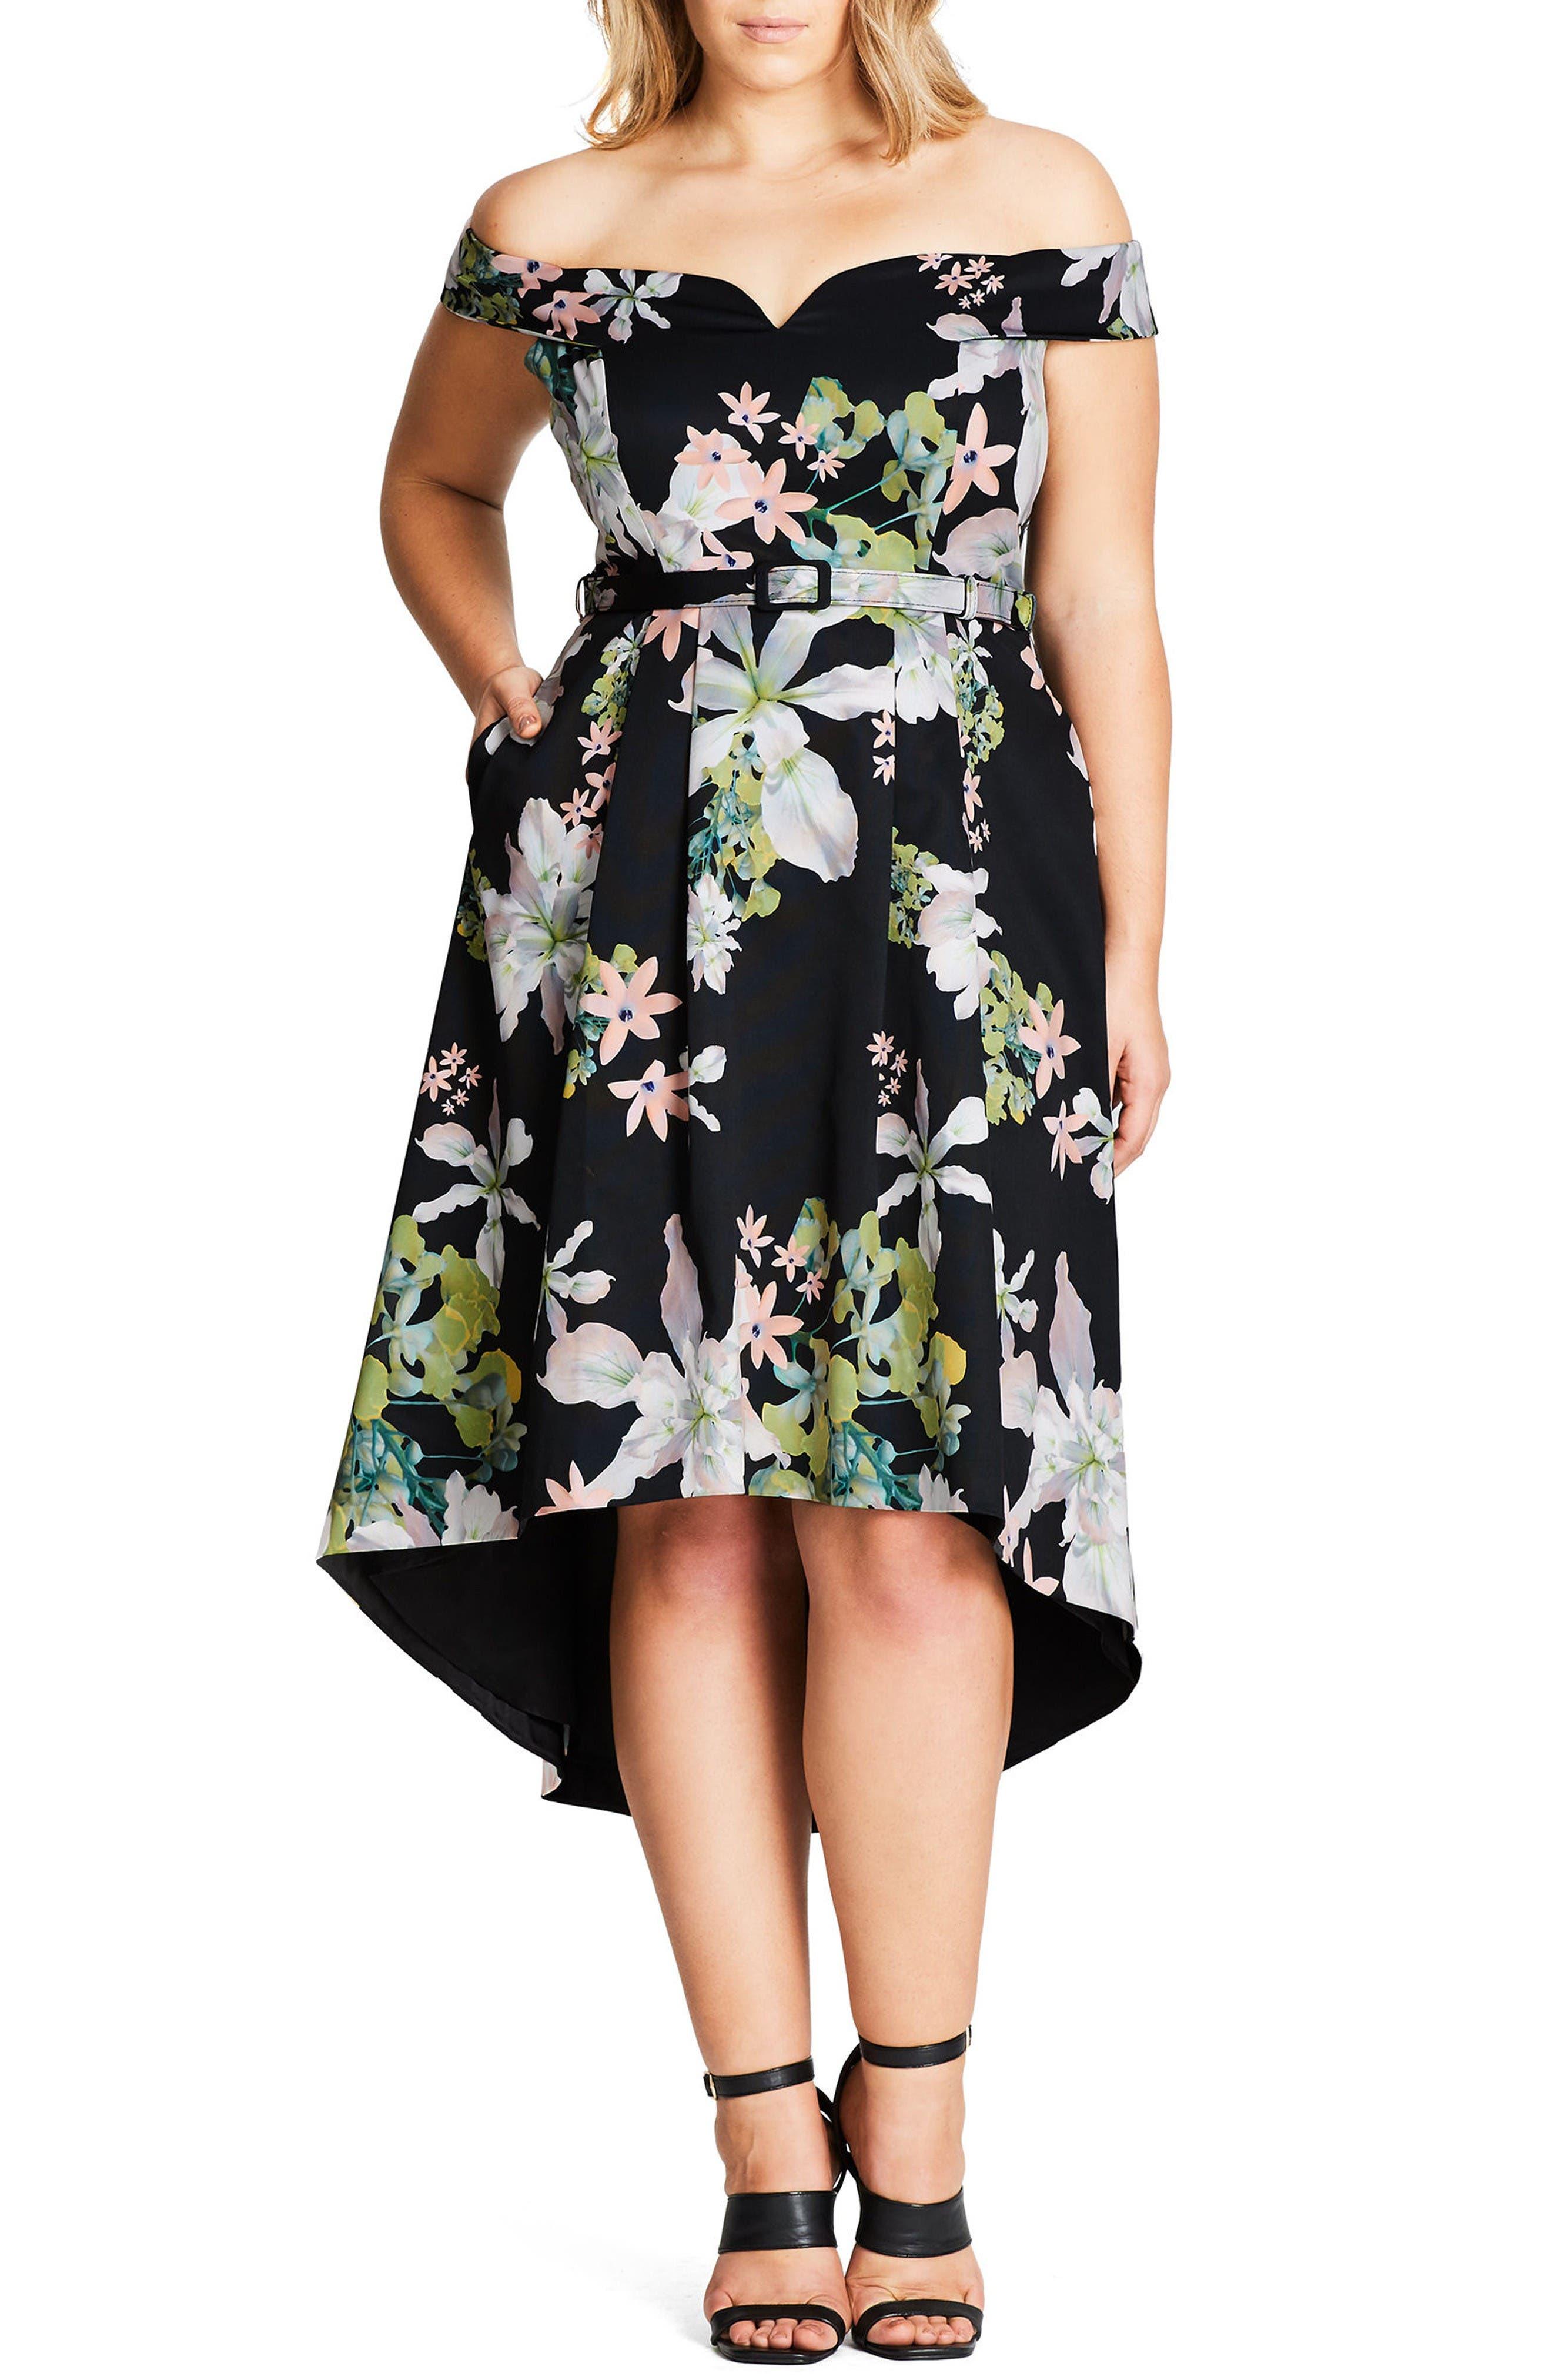 Alternate Image 1 Selected - City Chic Spring Belted Off the Shoulder Dress (Plus Size)